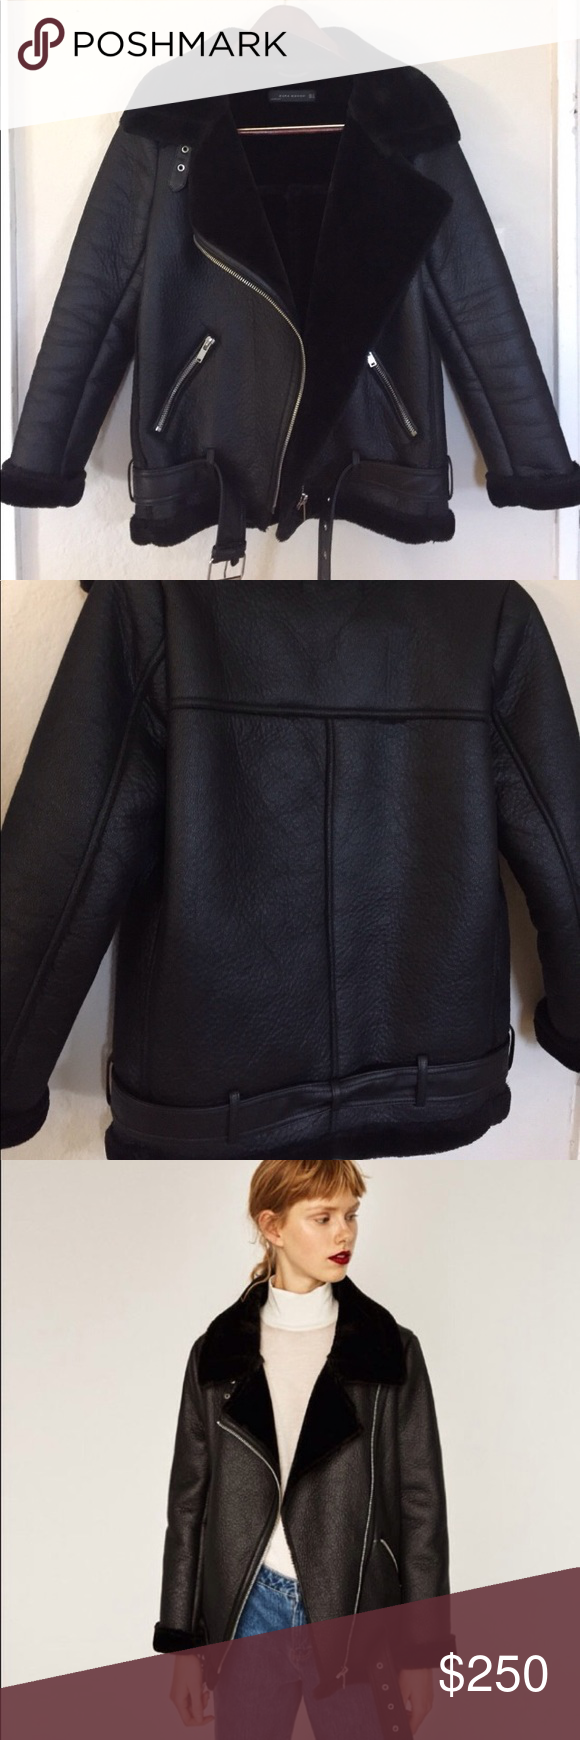 Zara Oversized NWOT Faux Fur Leather Jacket/Coat! Item is